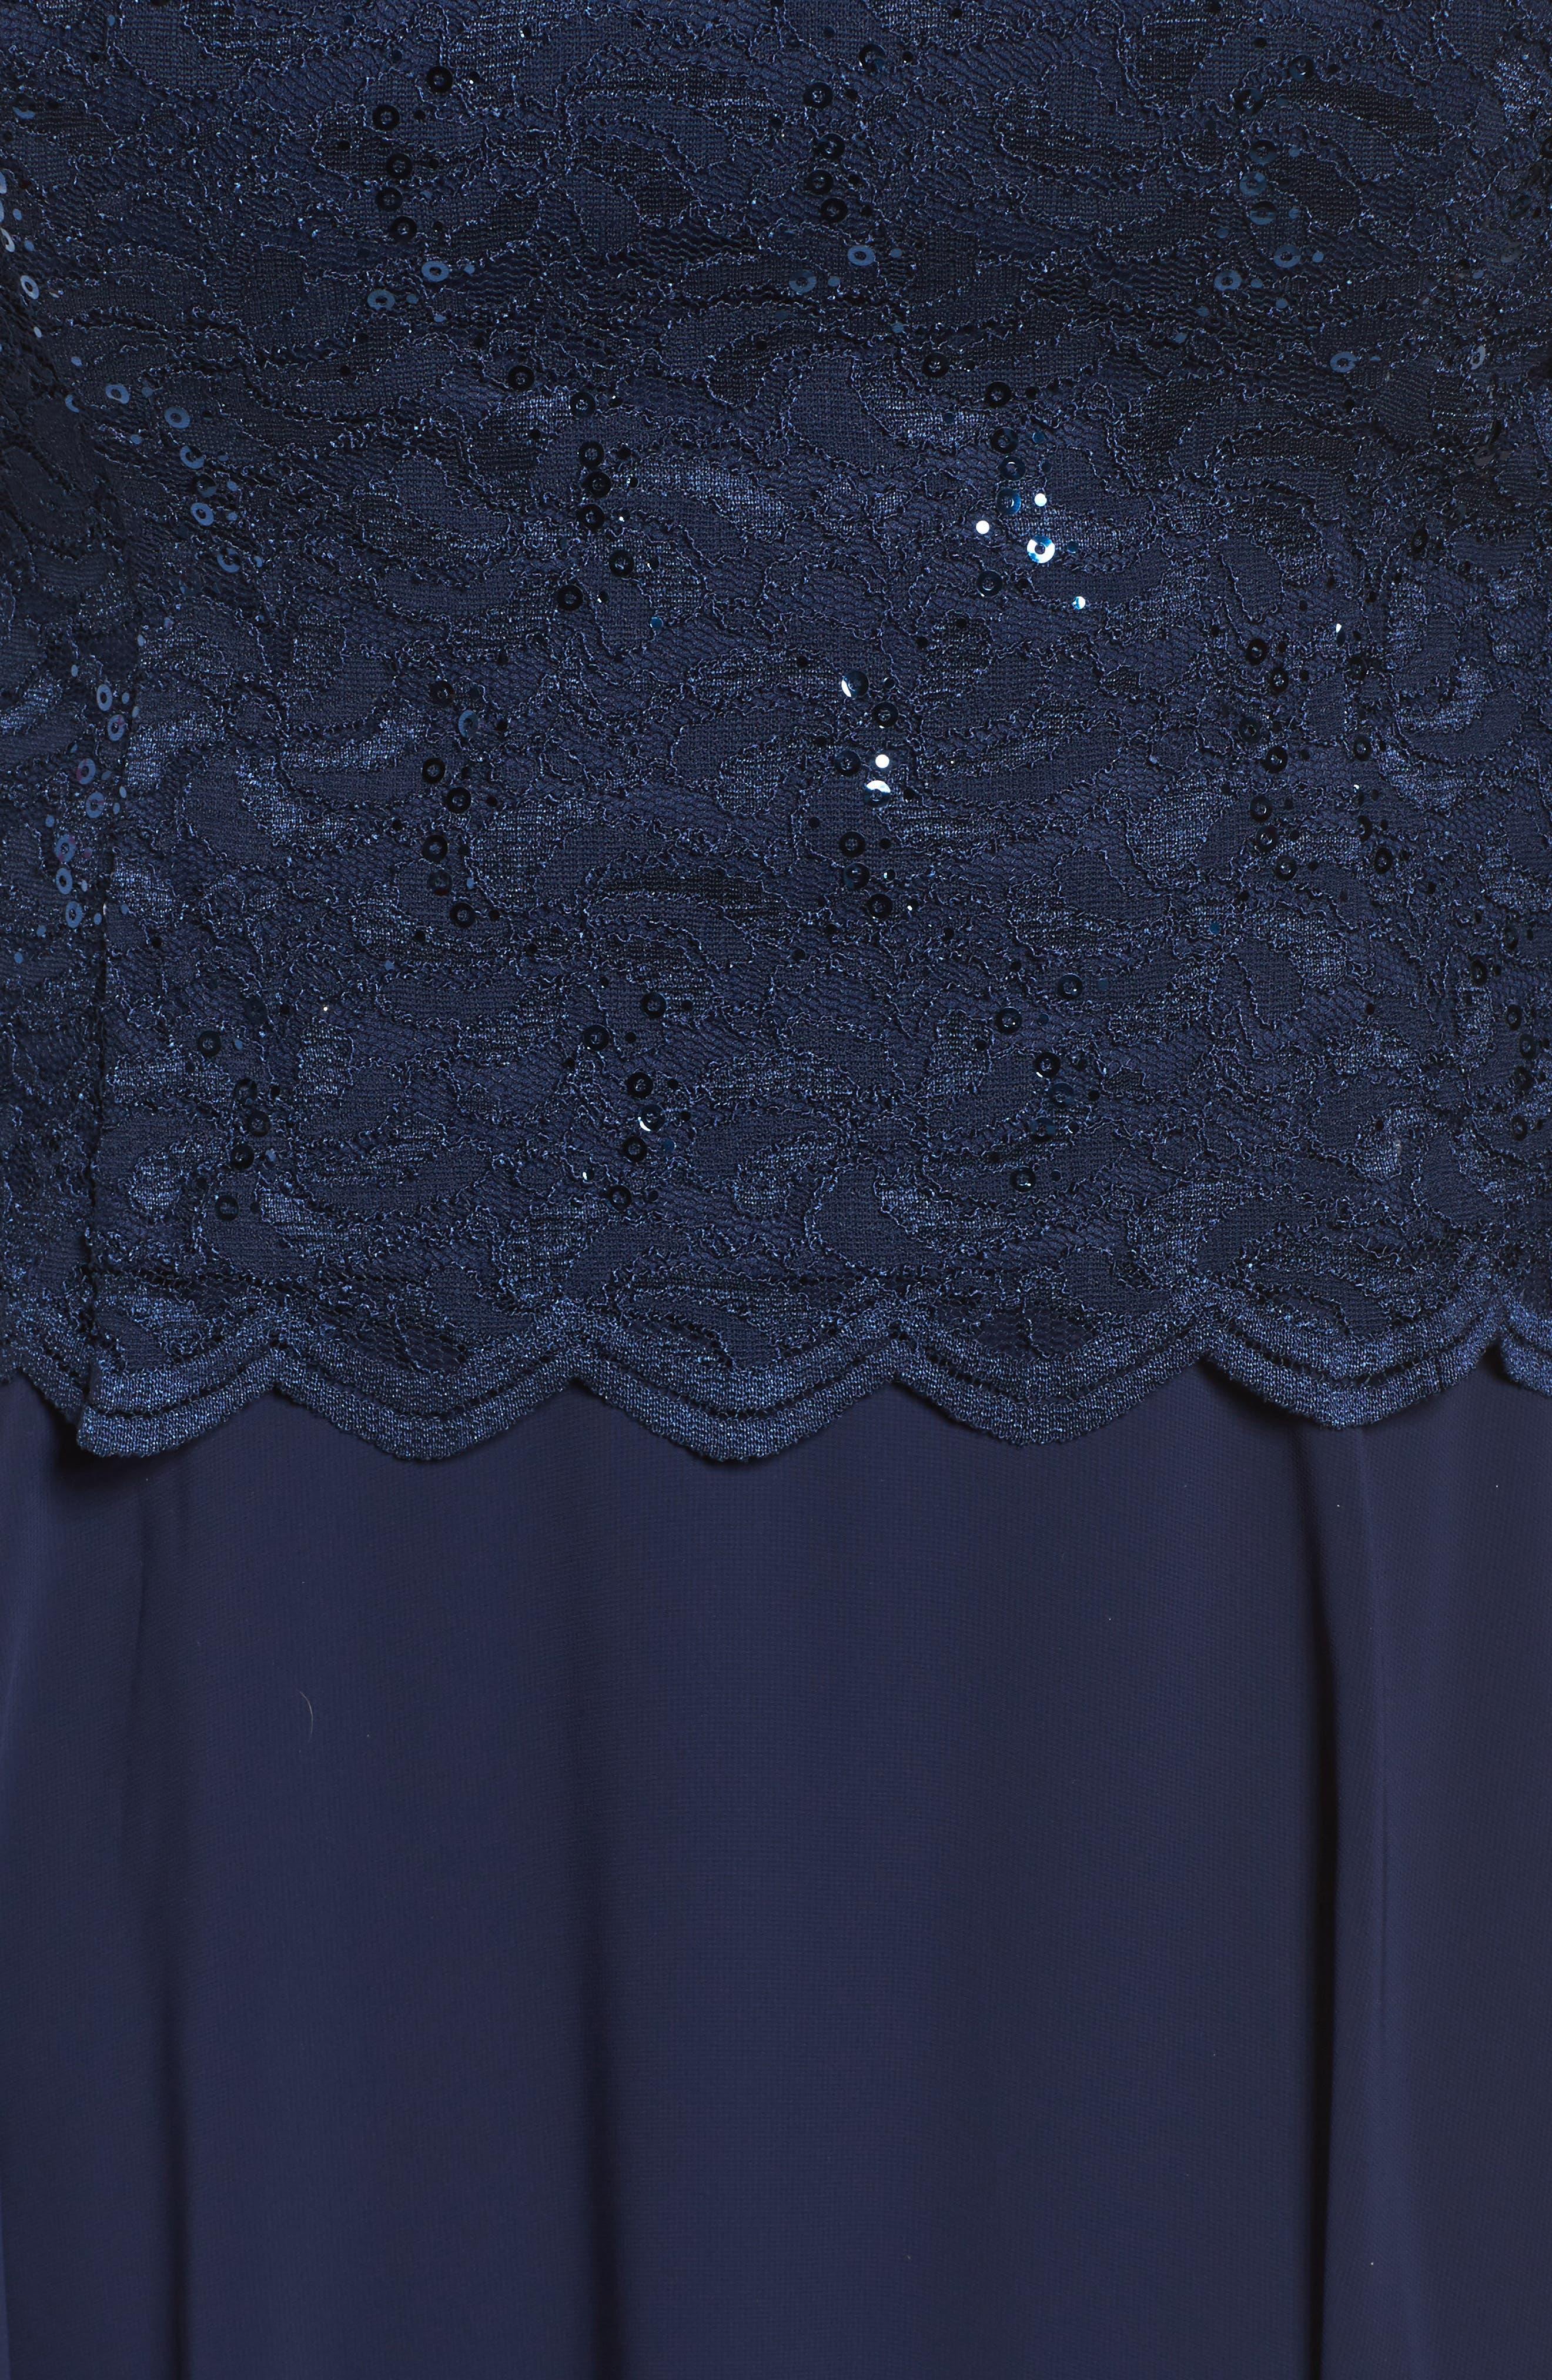 V-Neck Lace Dress,                             Alternate thumbnail 5, color,